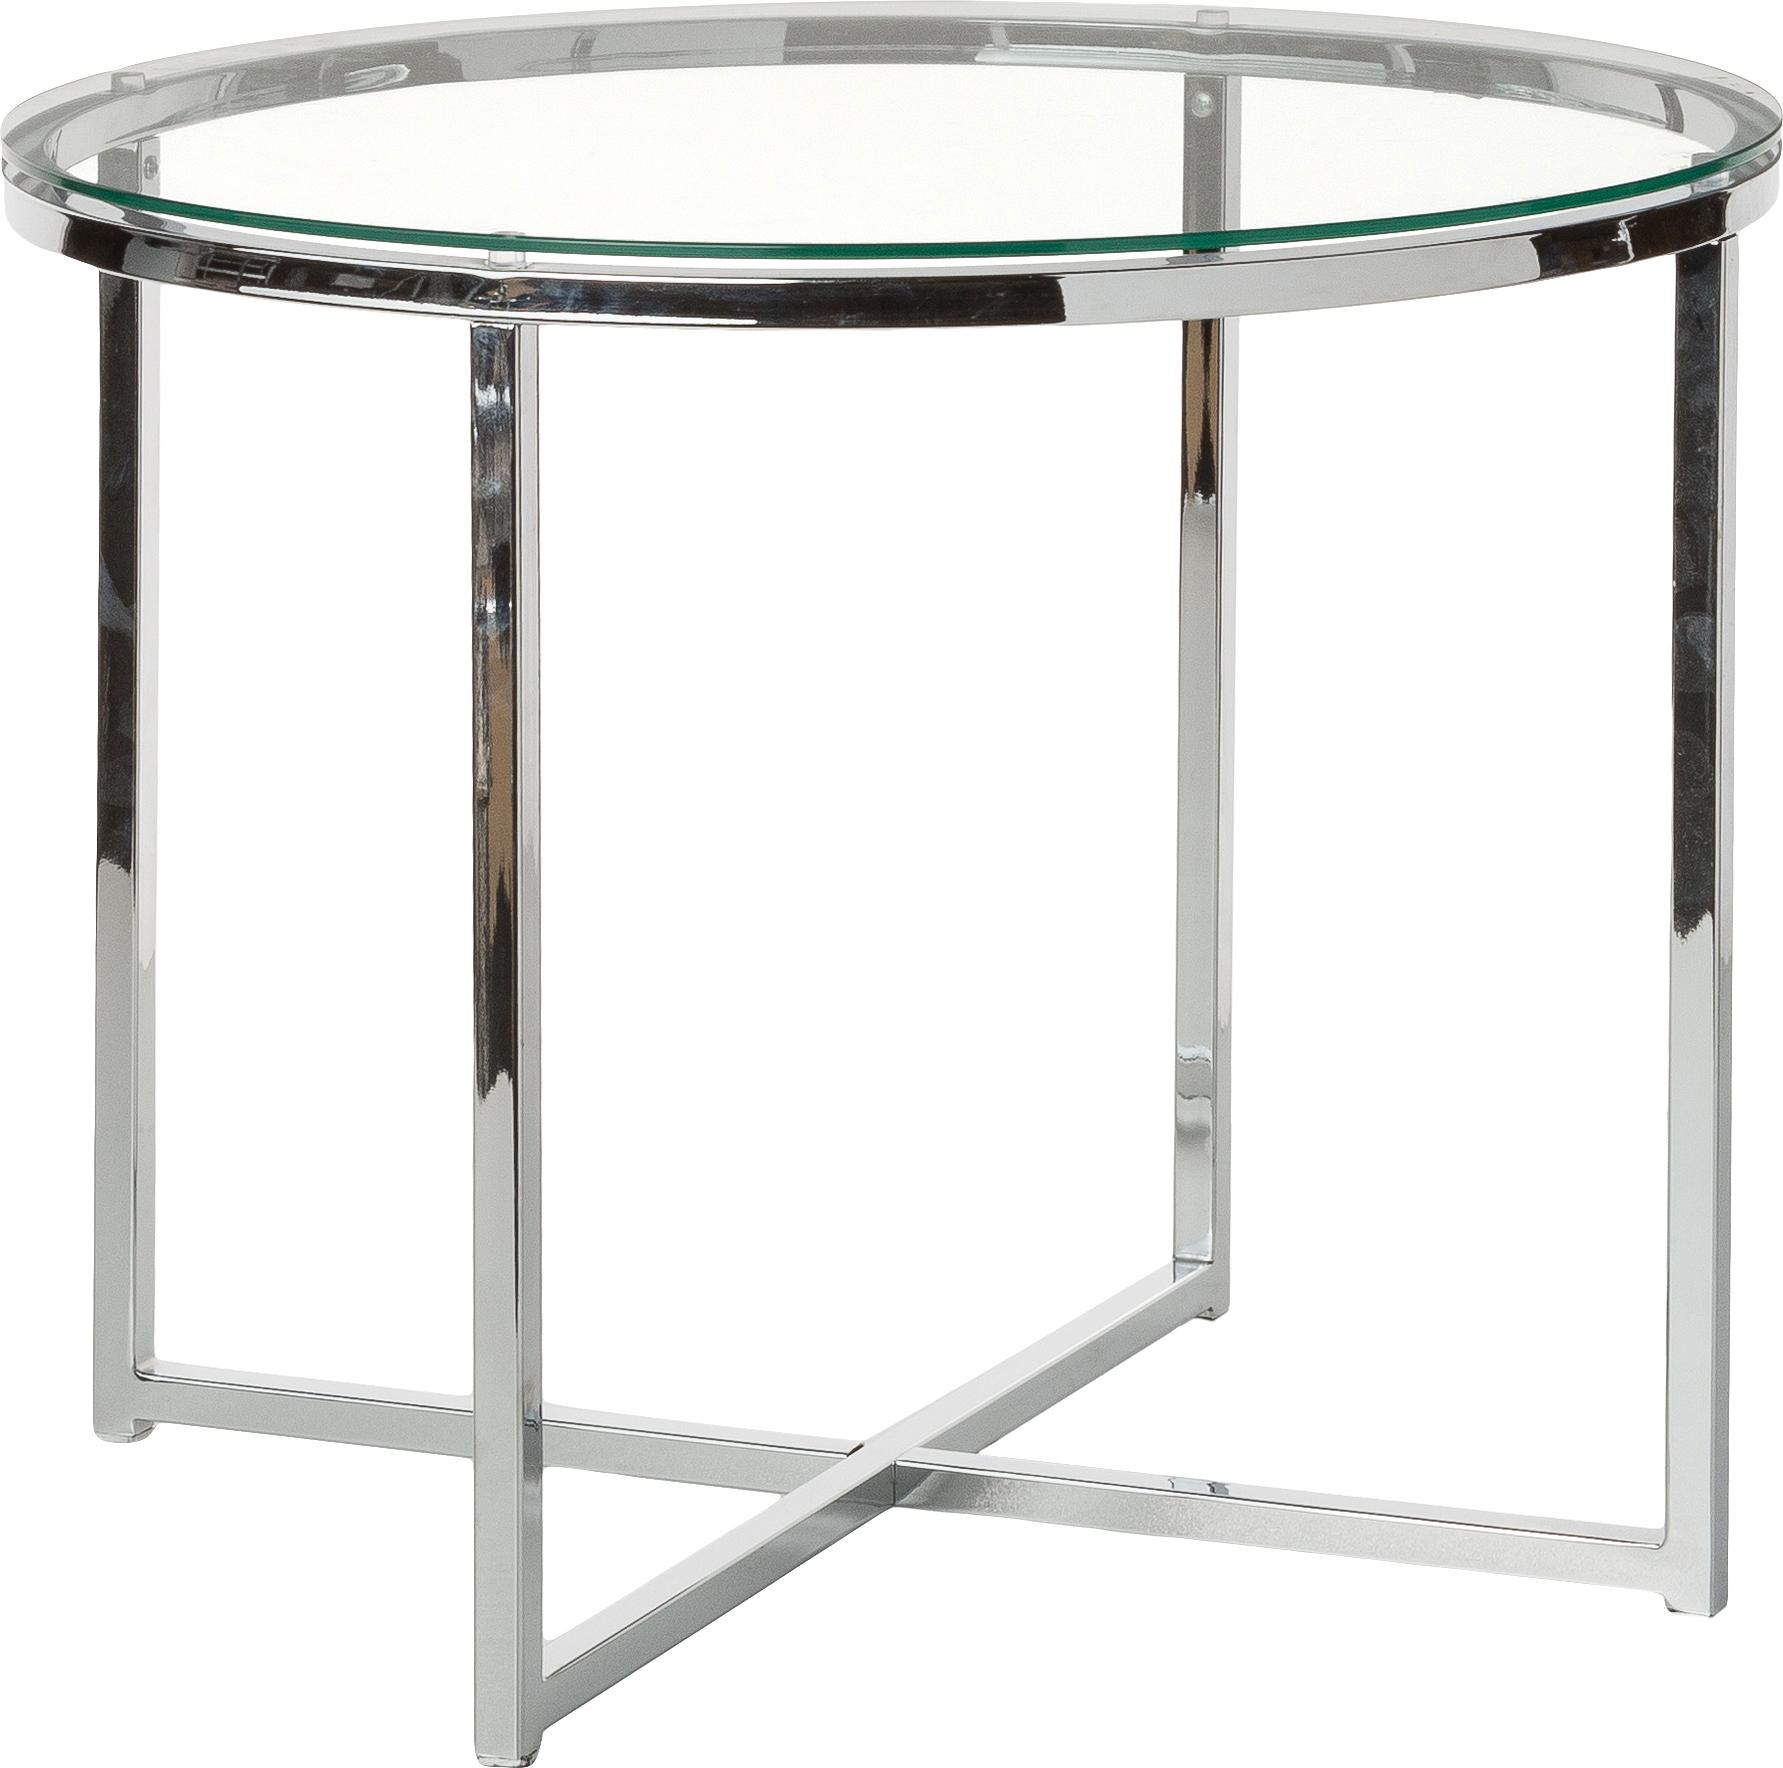 Mesa auxiliar Matheo, tablero de cristal, Estructura: metal, cromado, Tablero: vidrio laminado, Transparente, metal cromado., Ø 55 x Al 45 cm